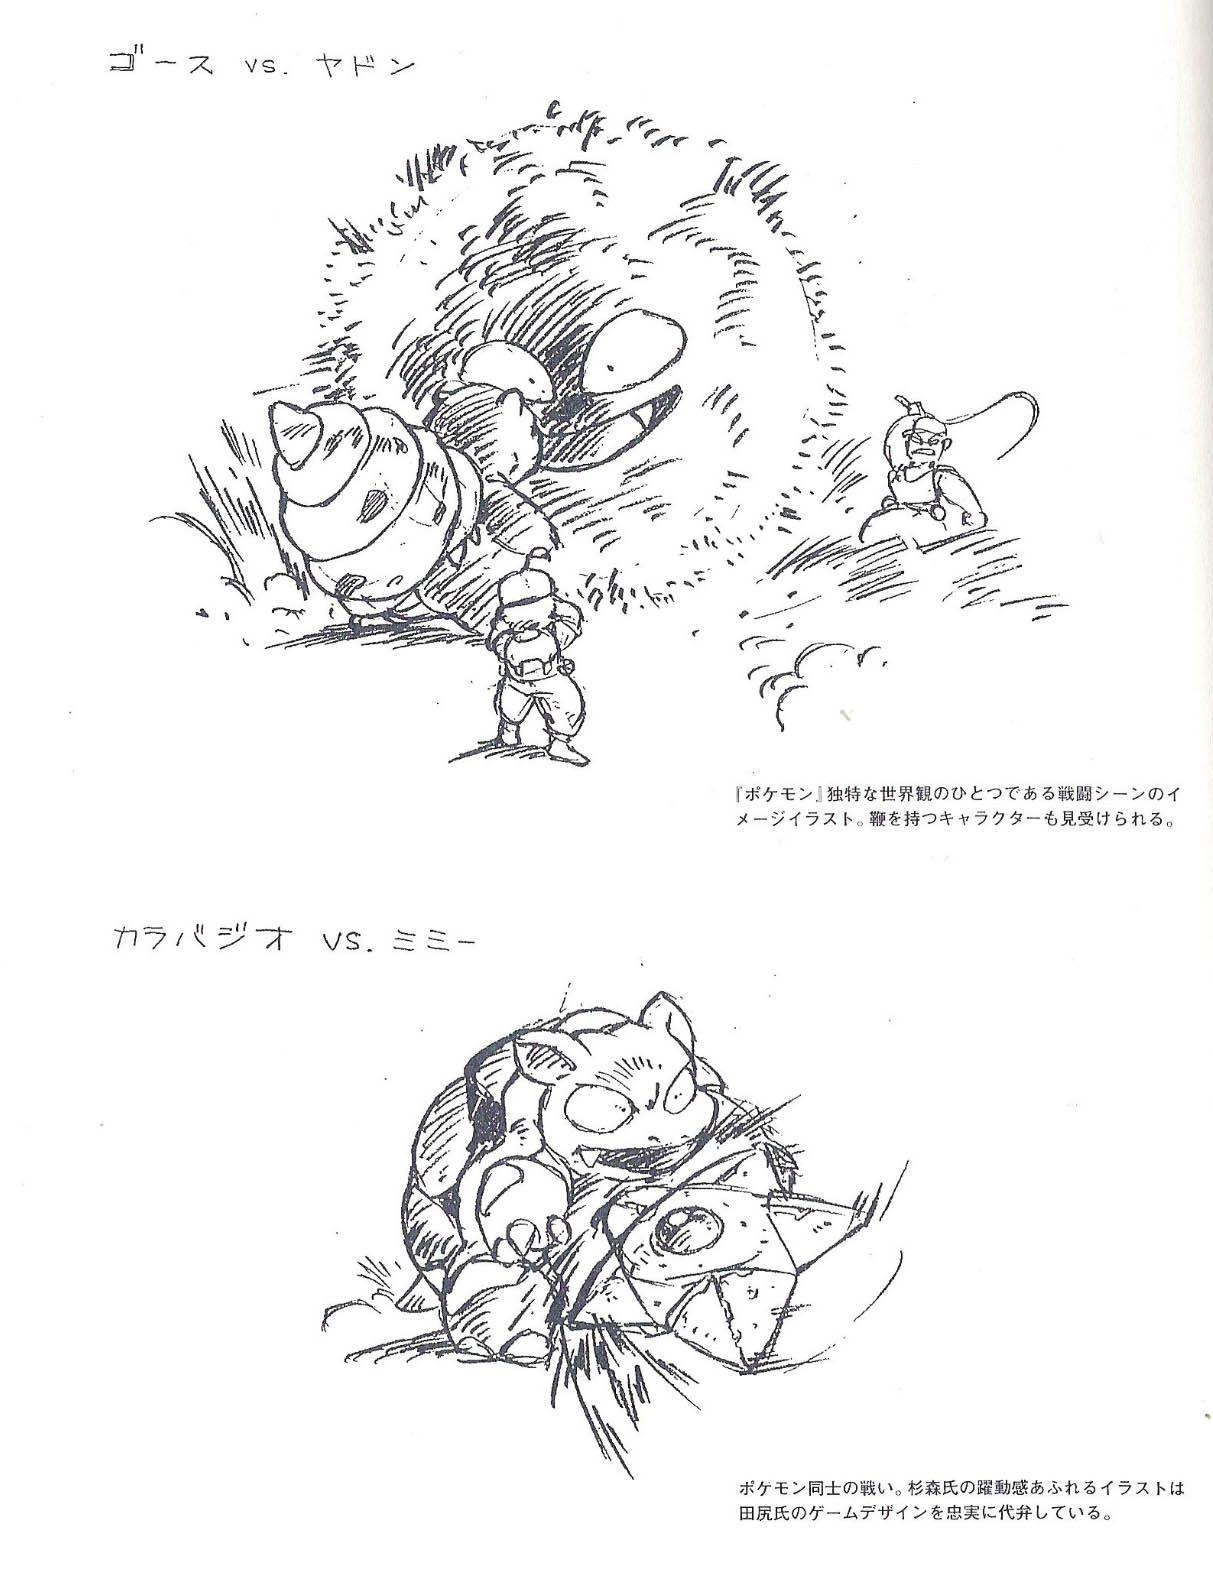 Ken Sugimori Early Art